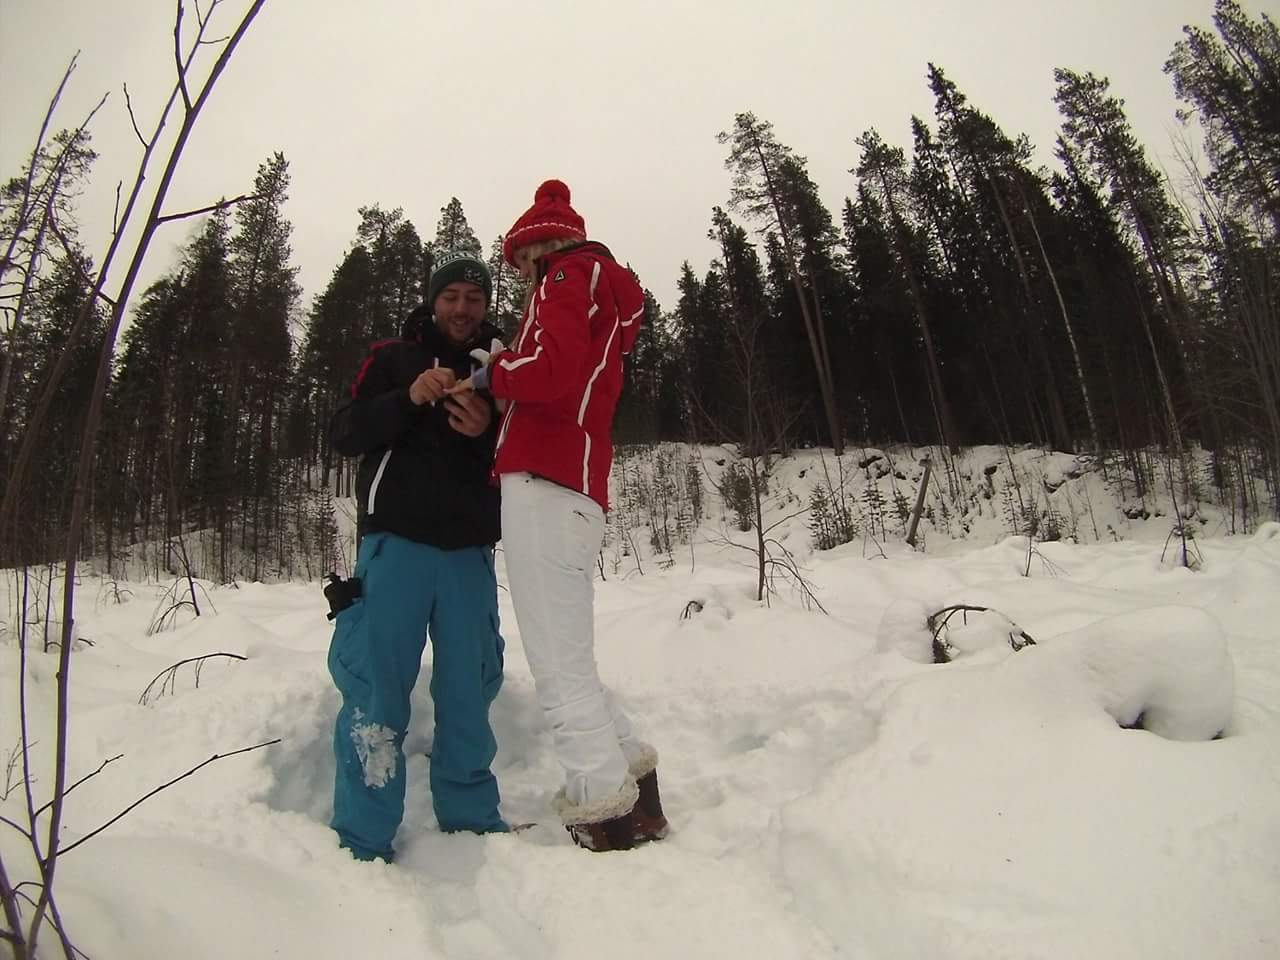 Image 2 of Lauren-Elizabeth and Rob